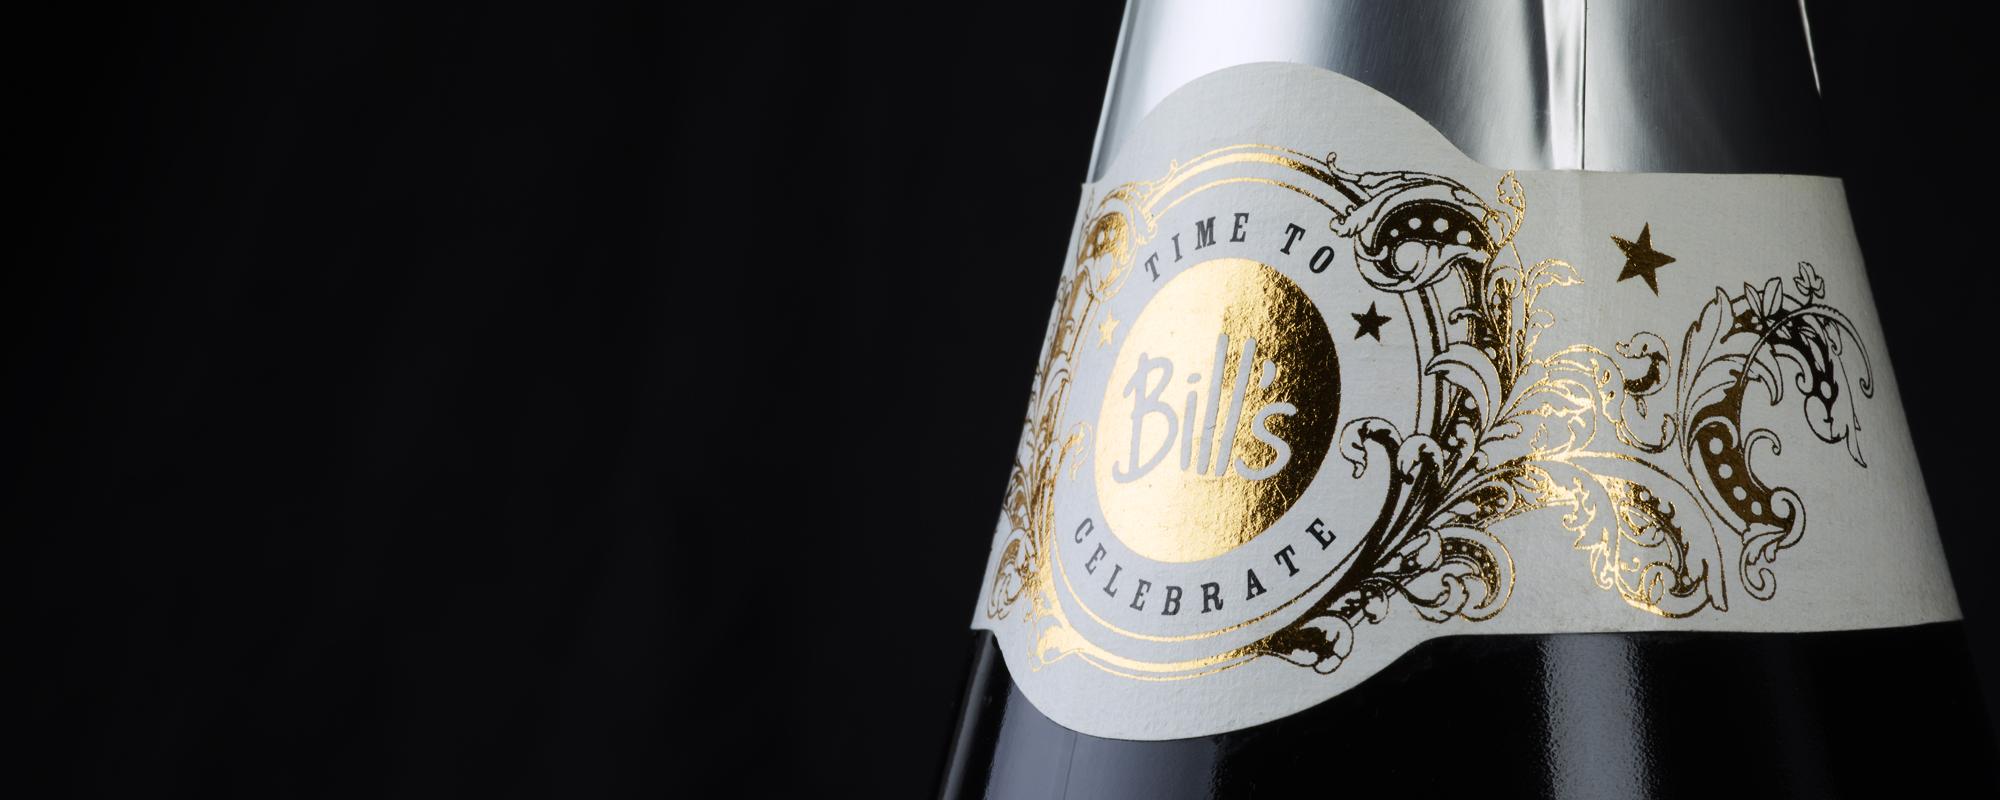 Bills Champagne